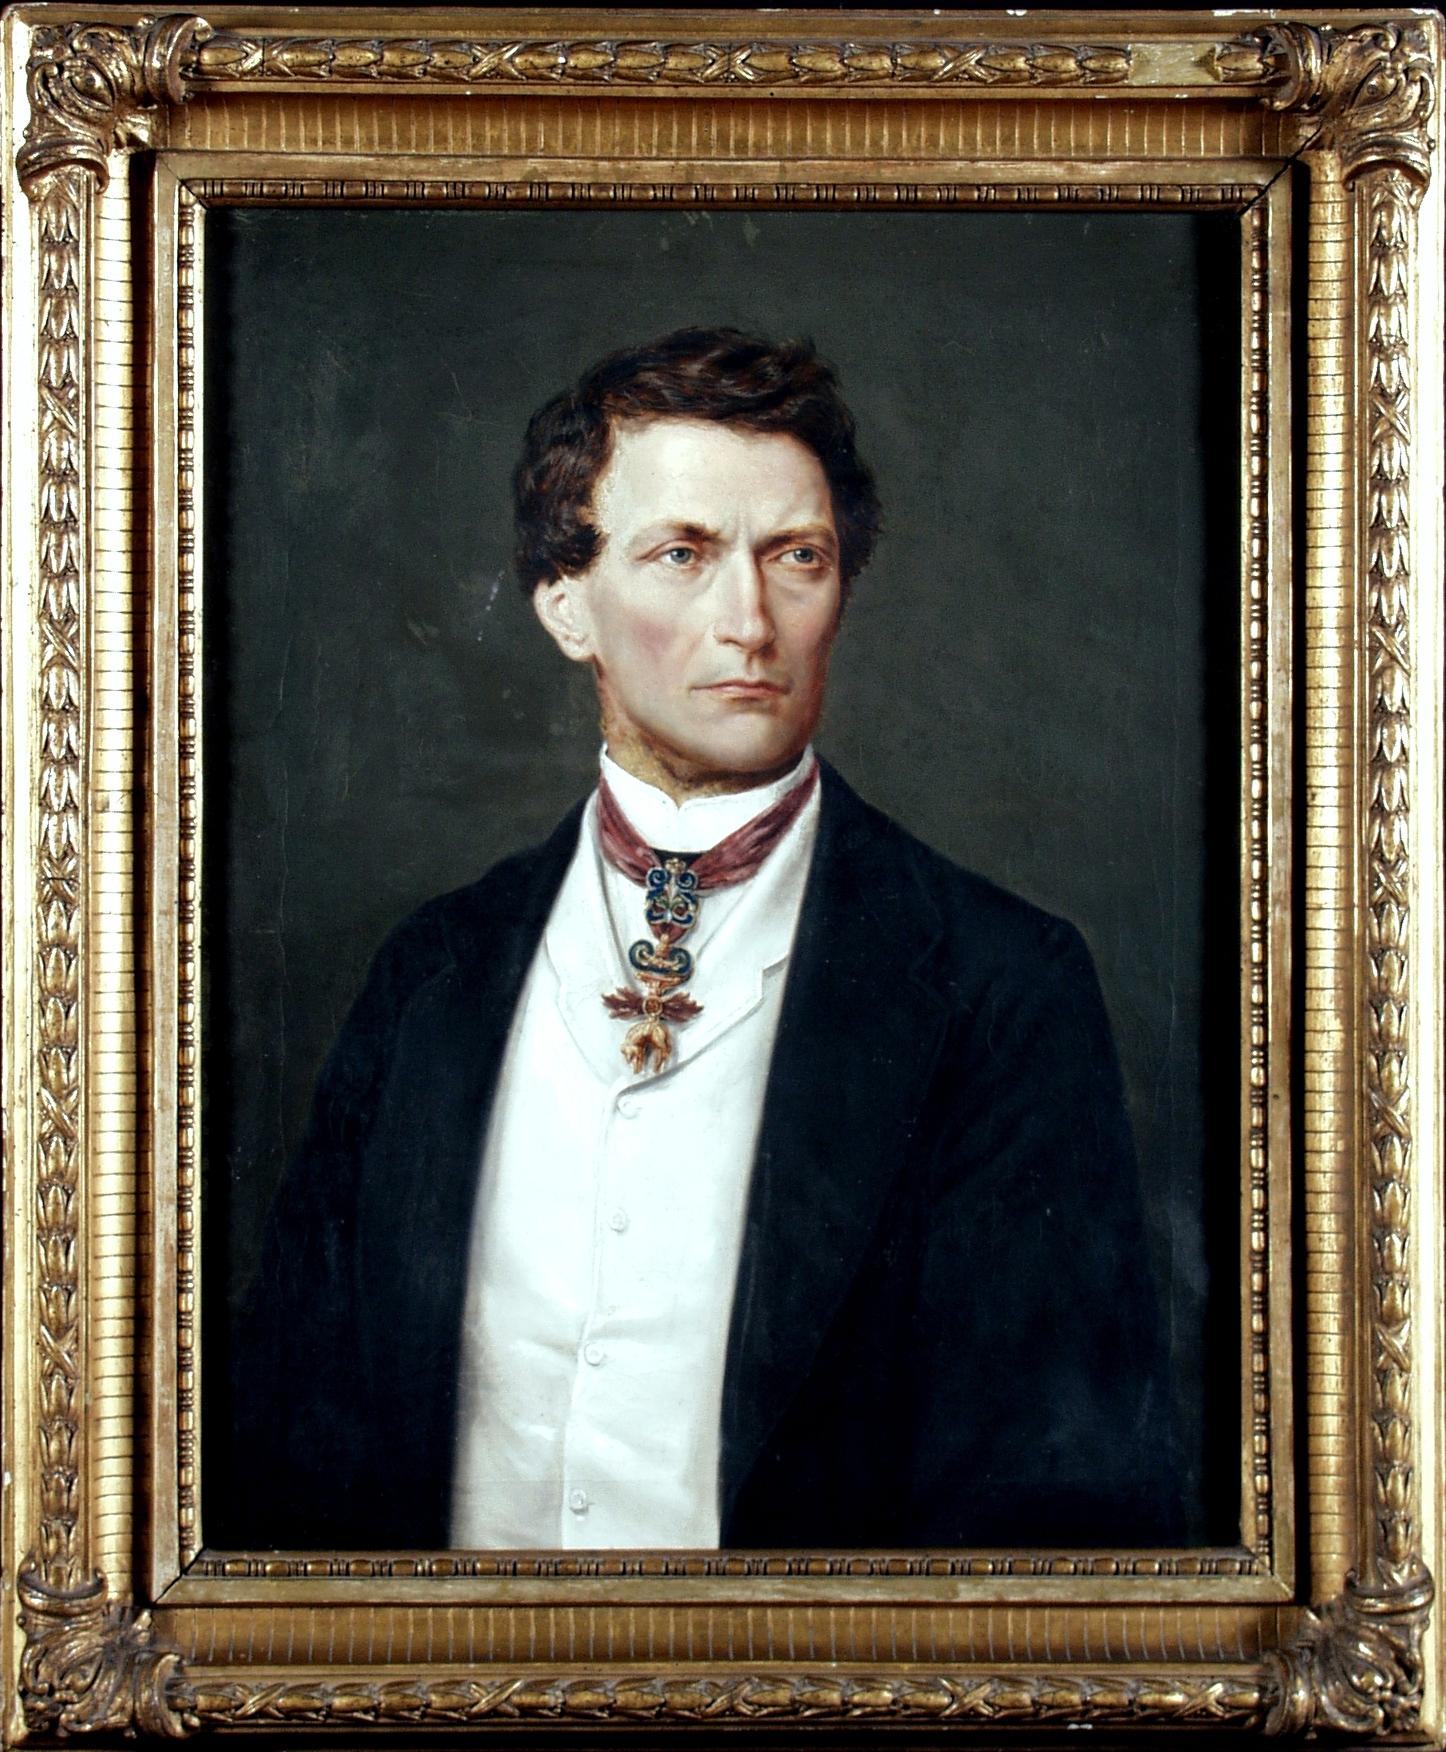 Alfred Józef hr. Potocki (18221889).